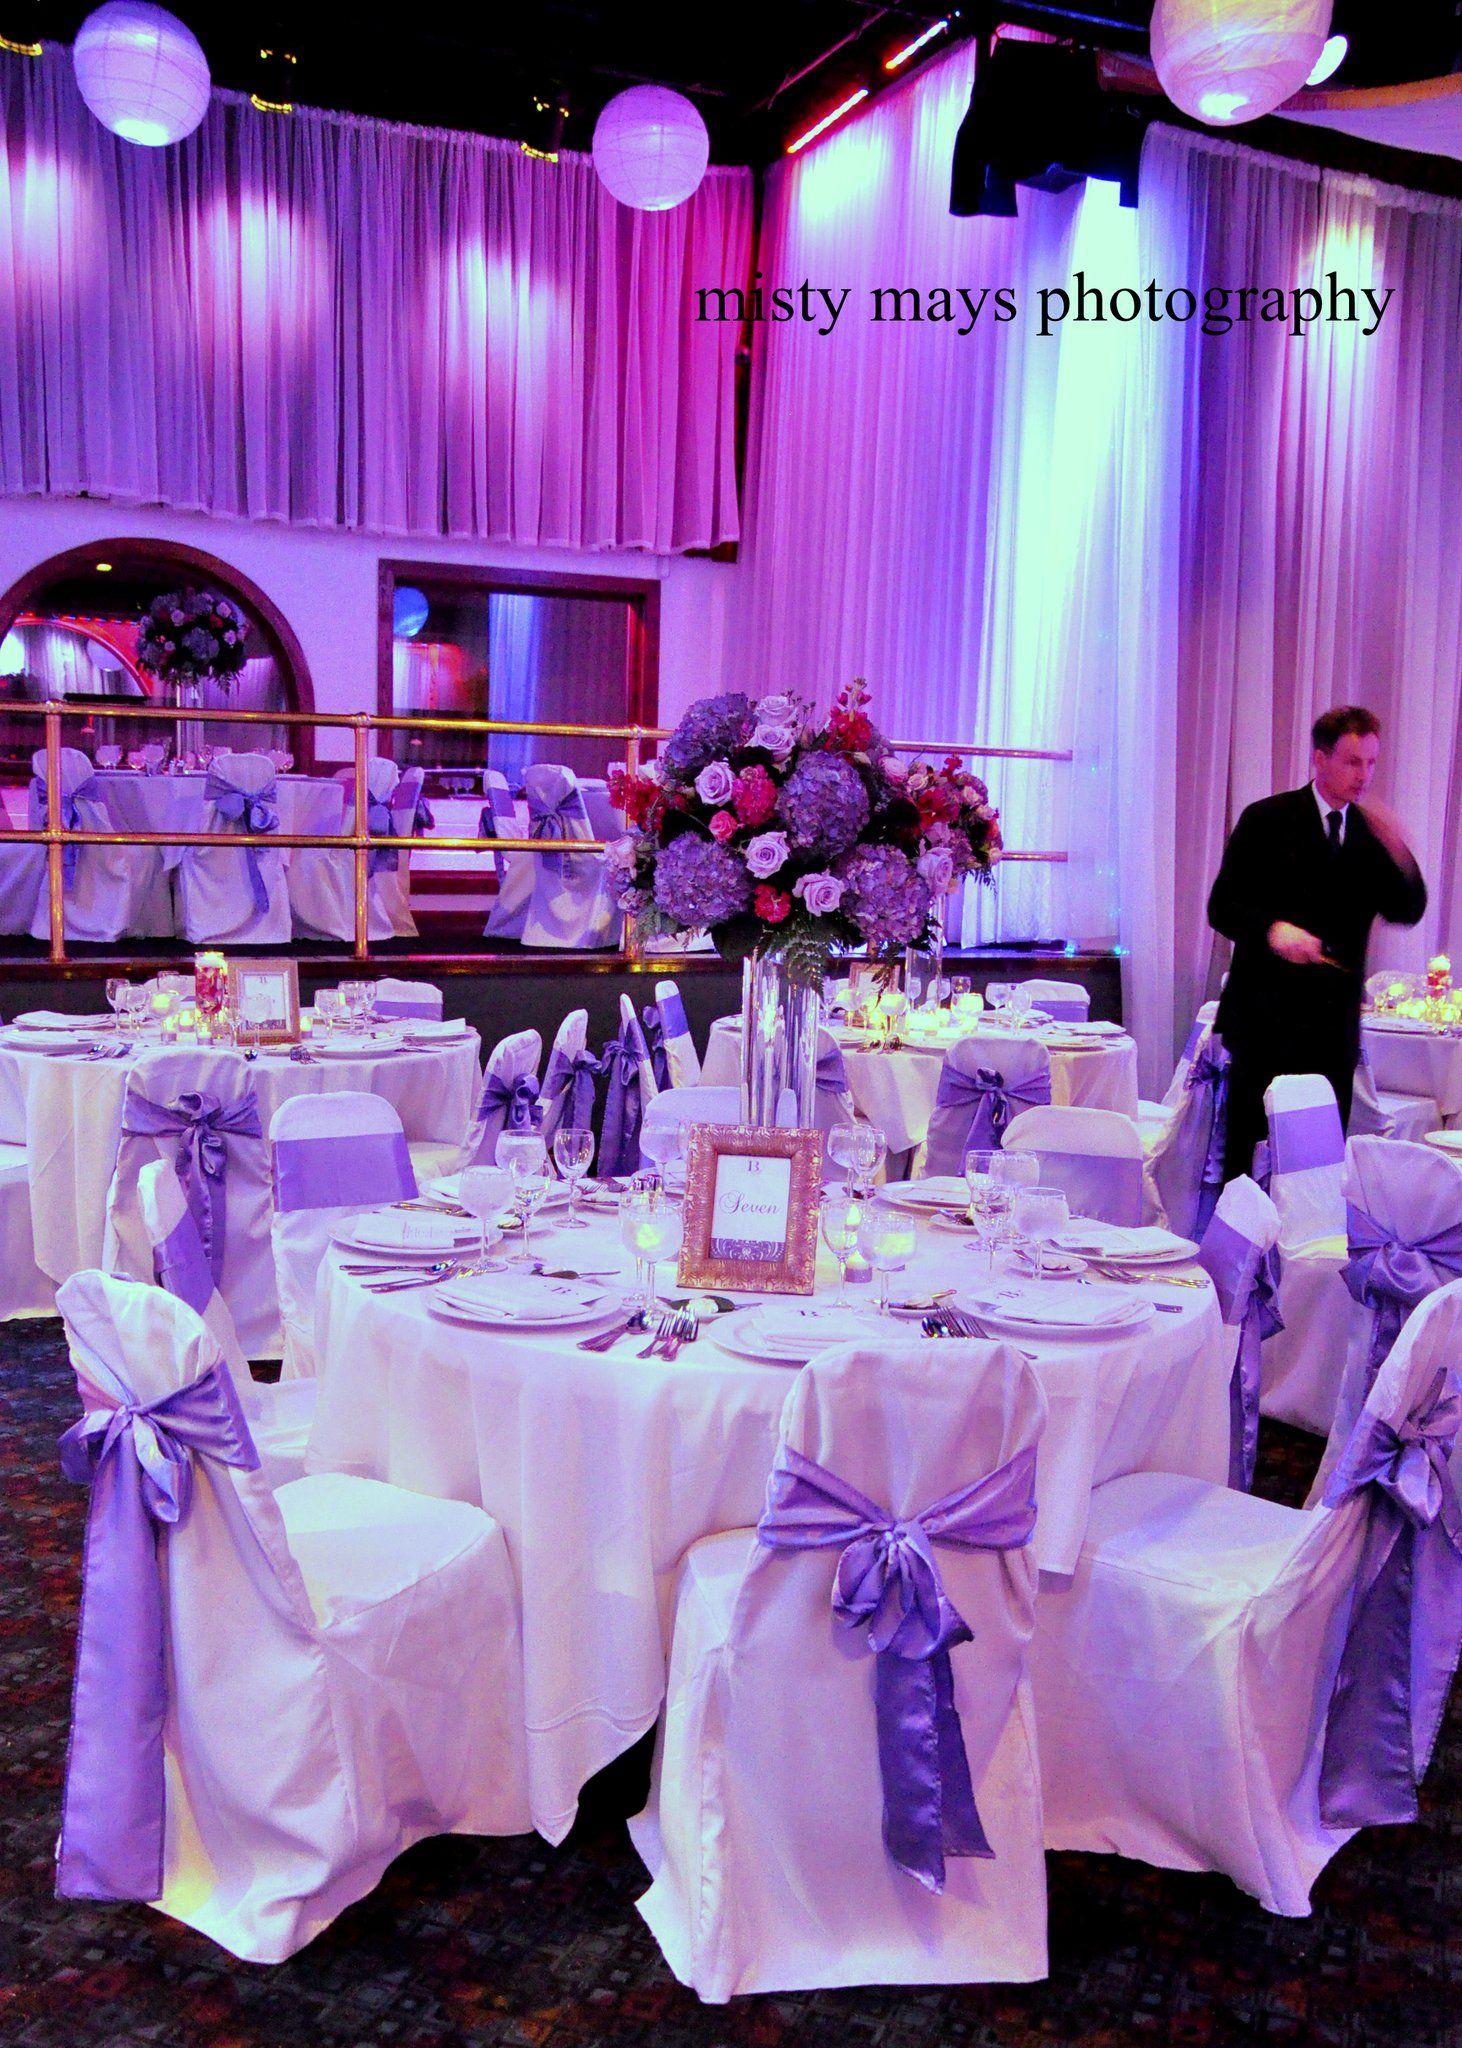 wedding decorations chairs receptions church bertolini tall centerpiece very pretty my centerpieces